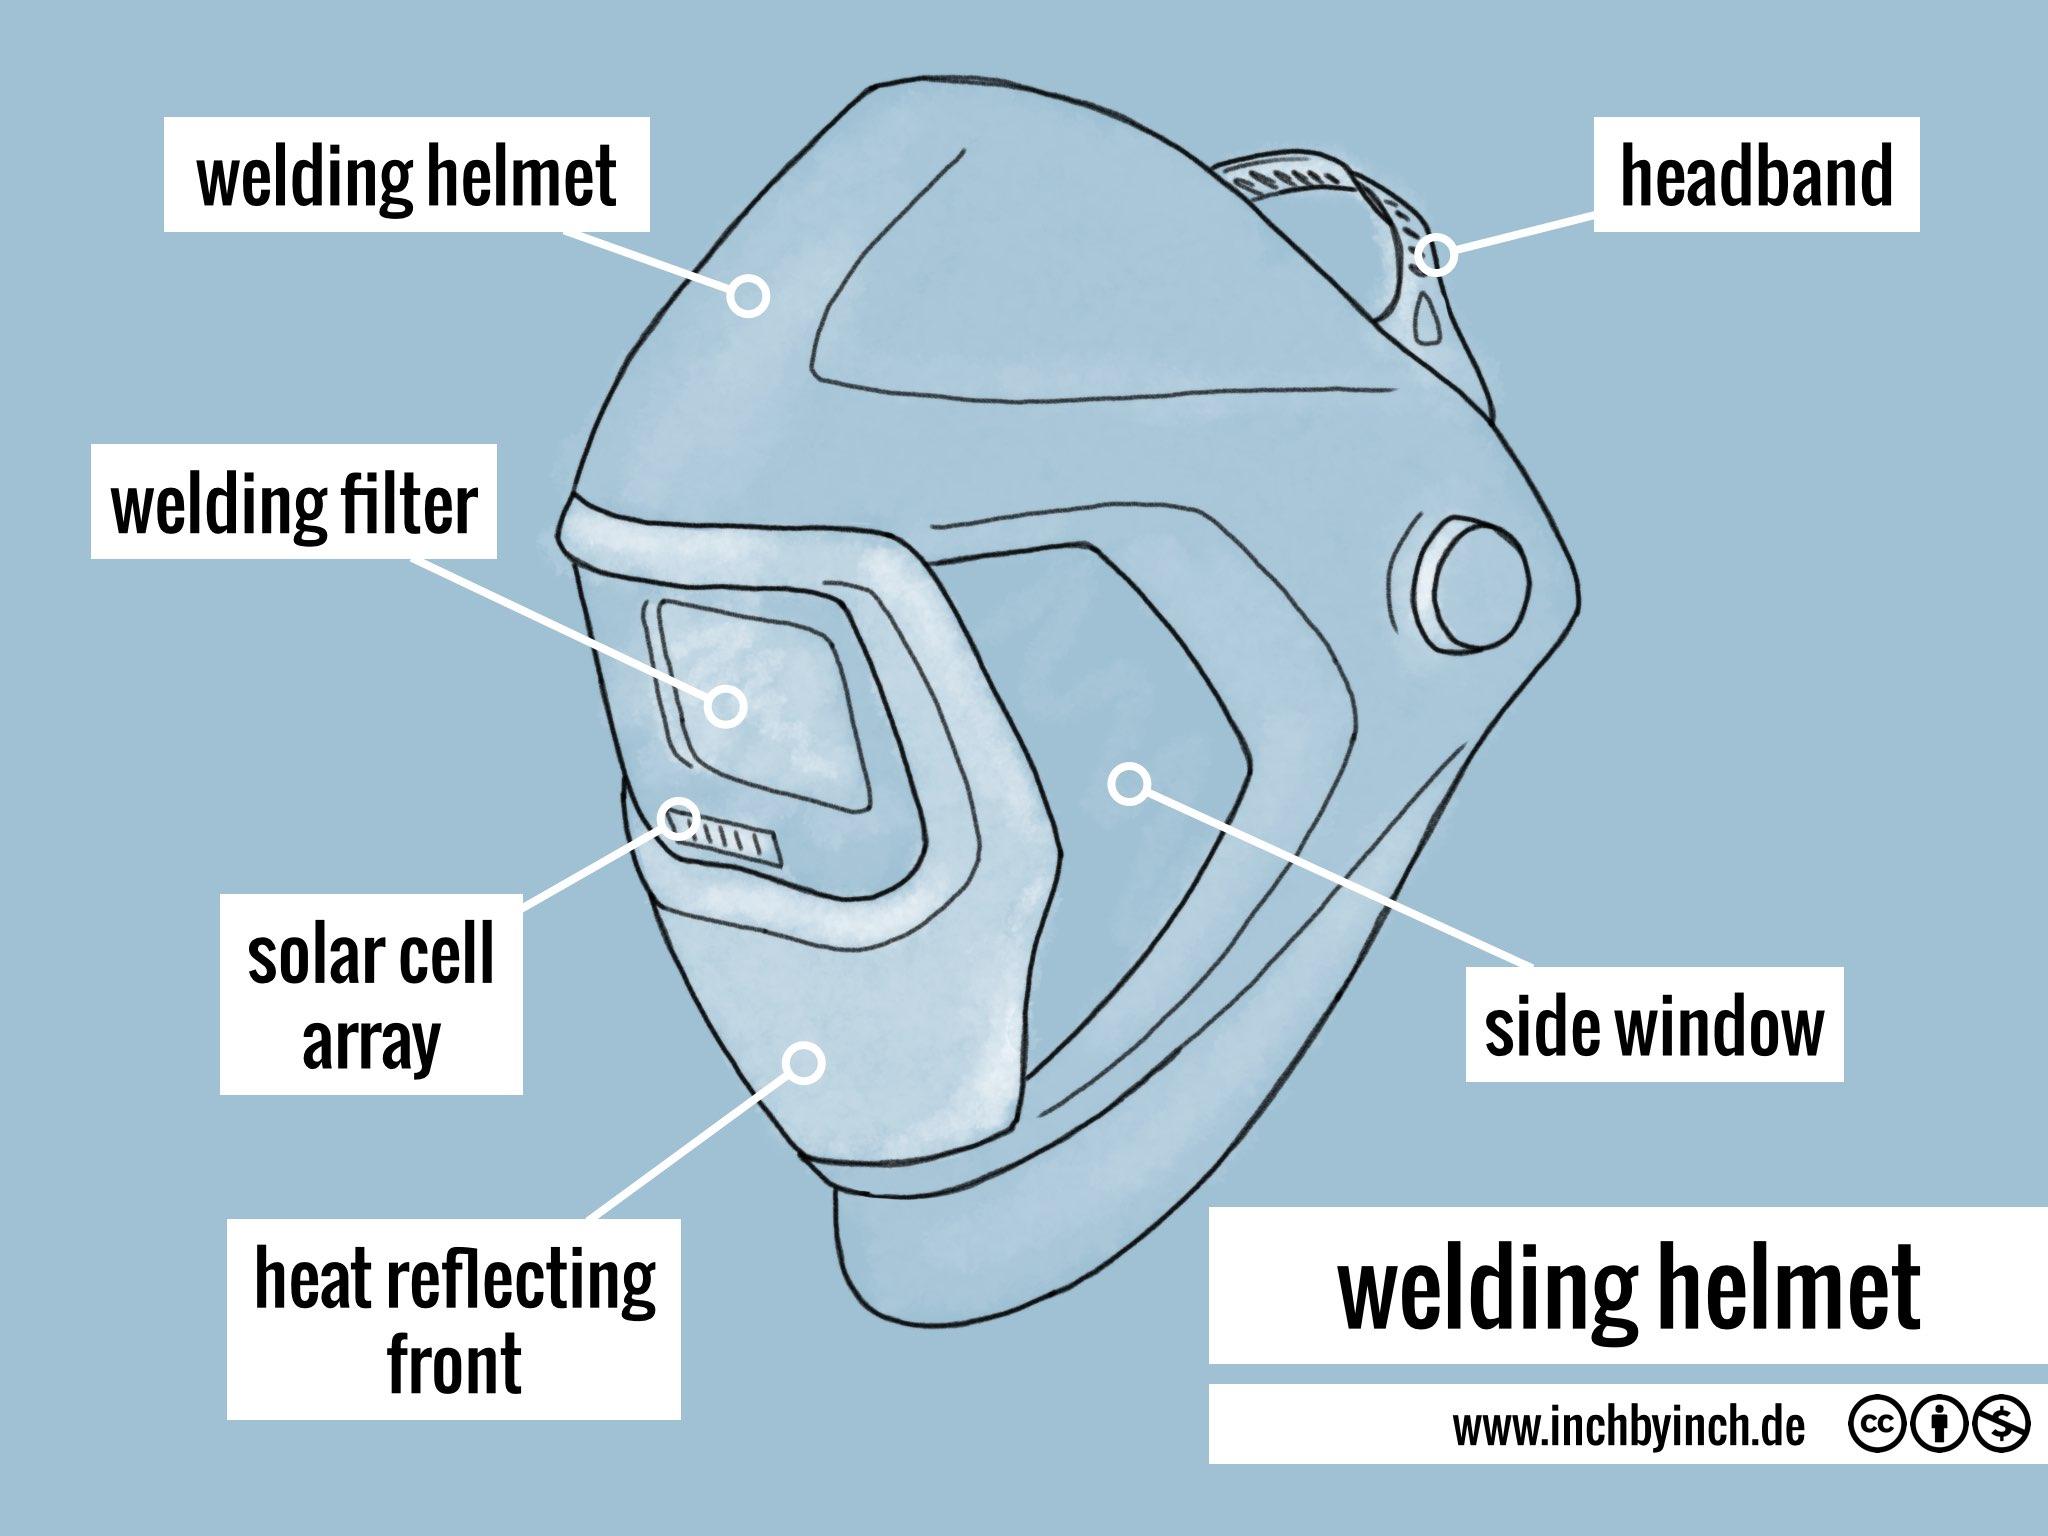 INCH - Technical English | welding helmetINCH - Technical English